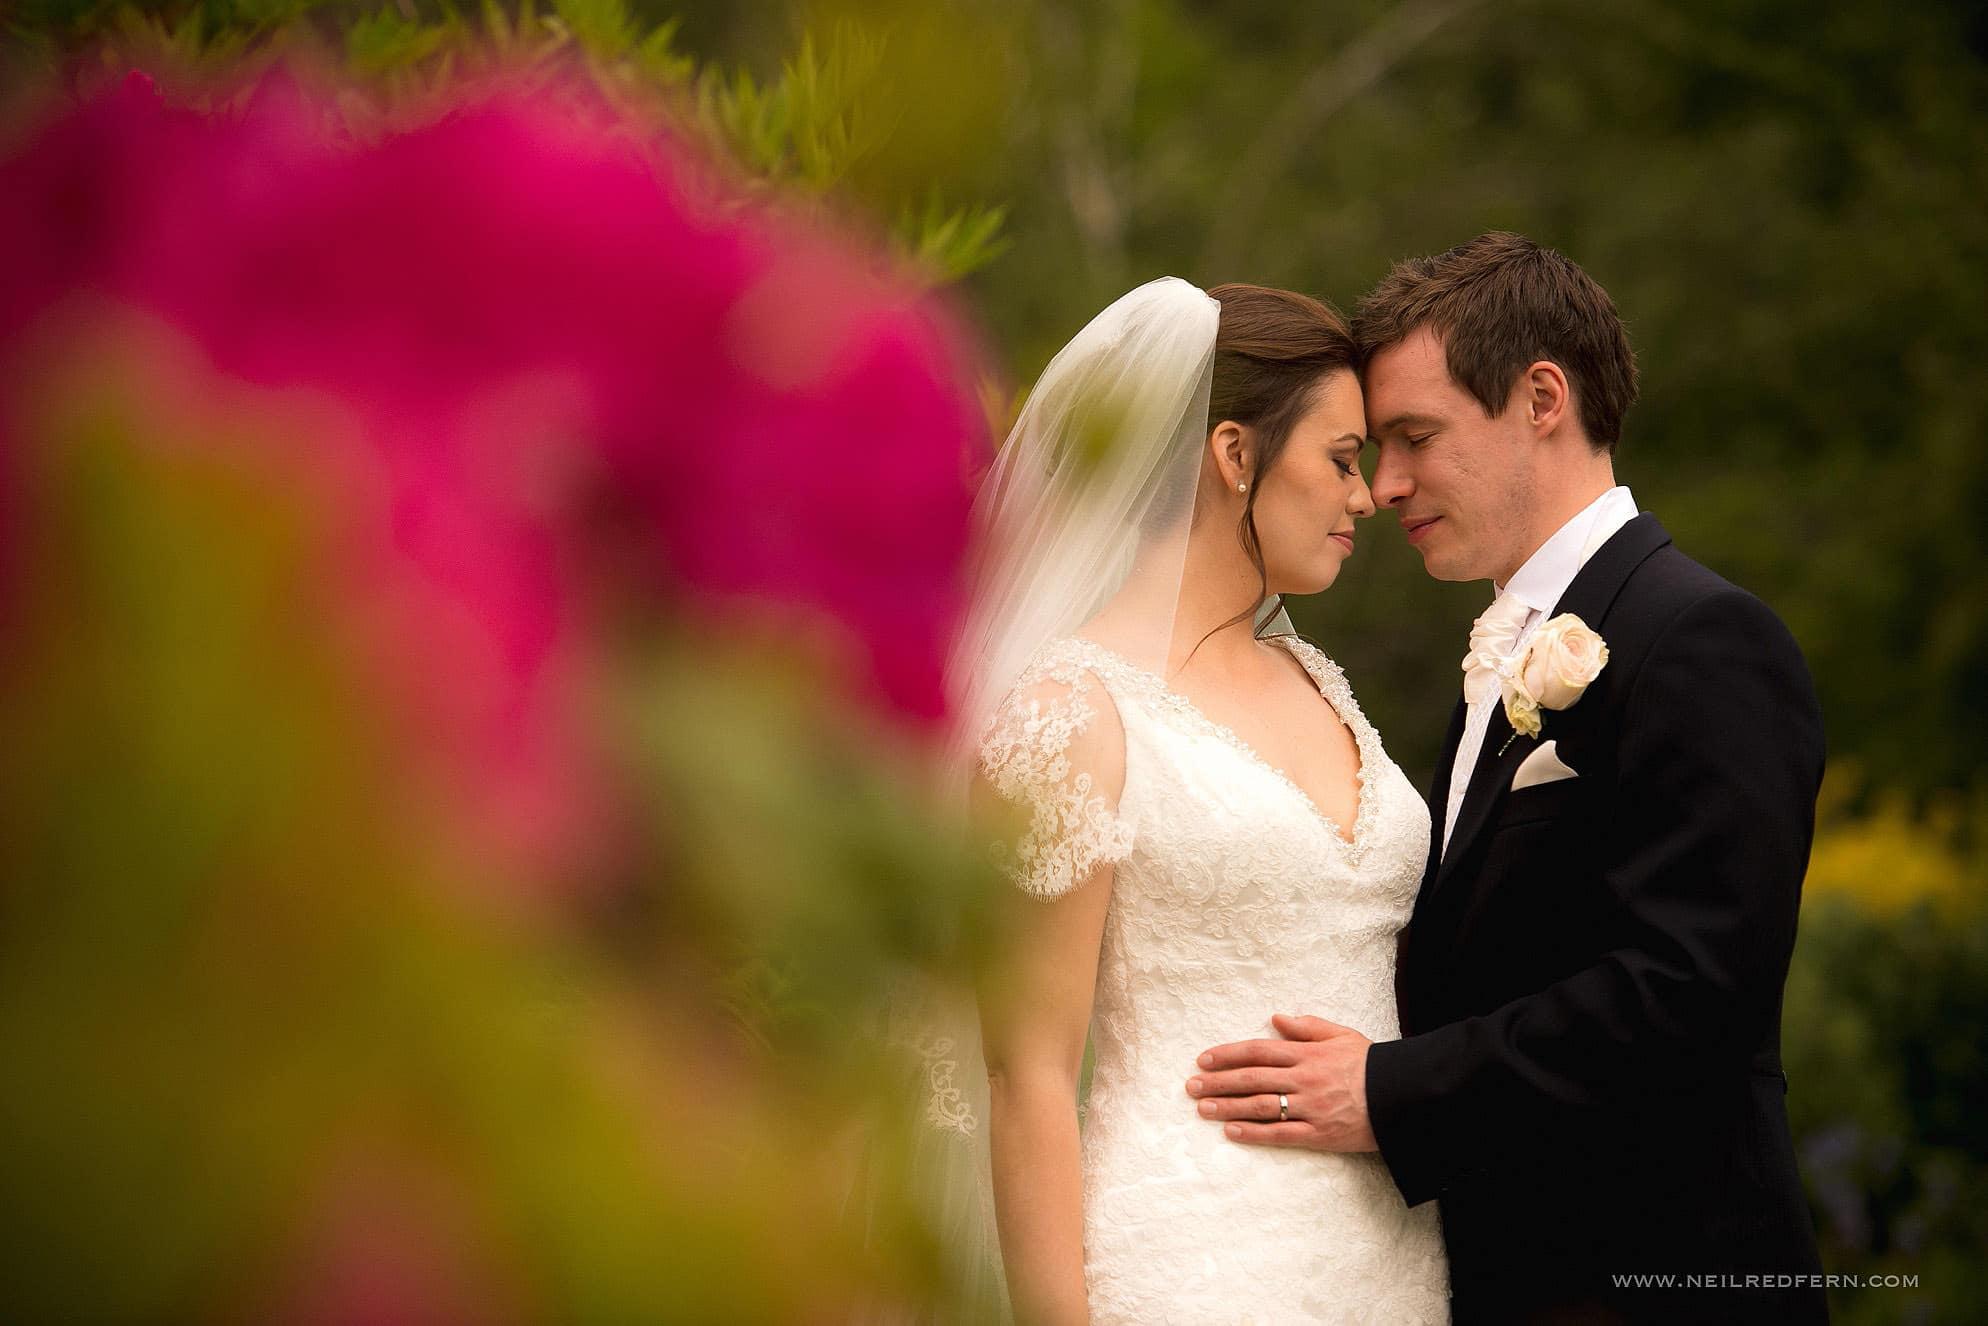 Cragwood Hotel wedding photographs 08